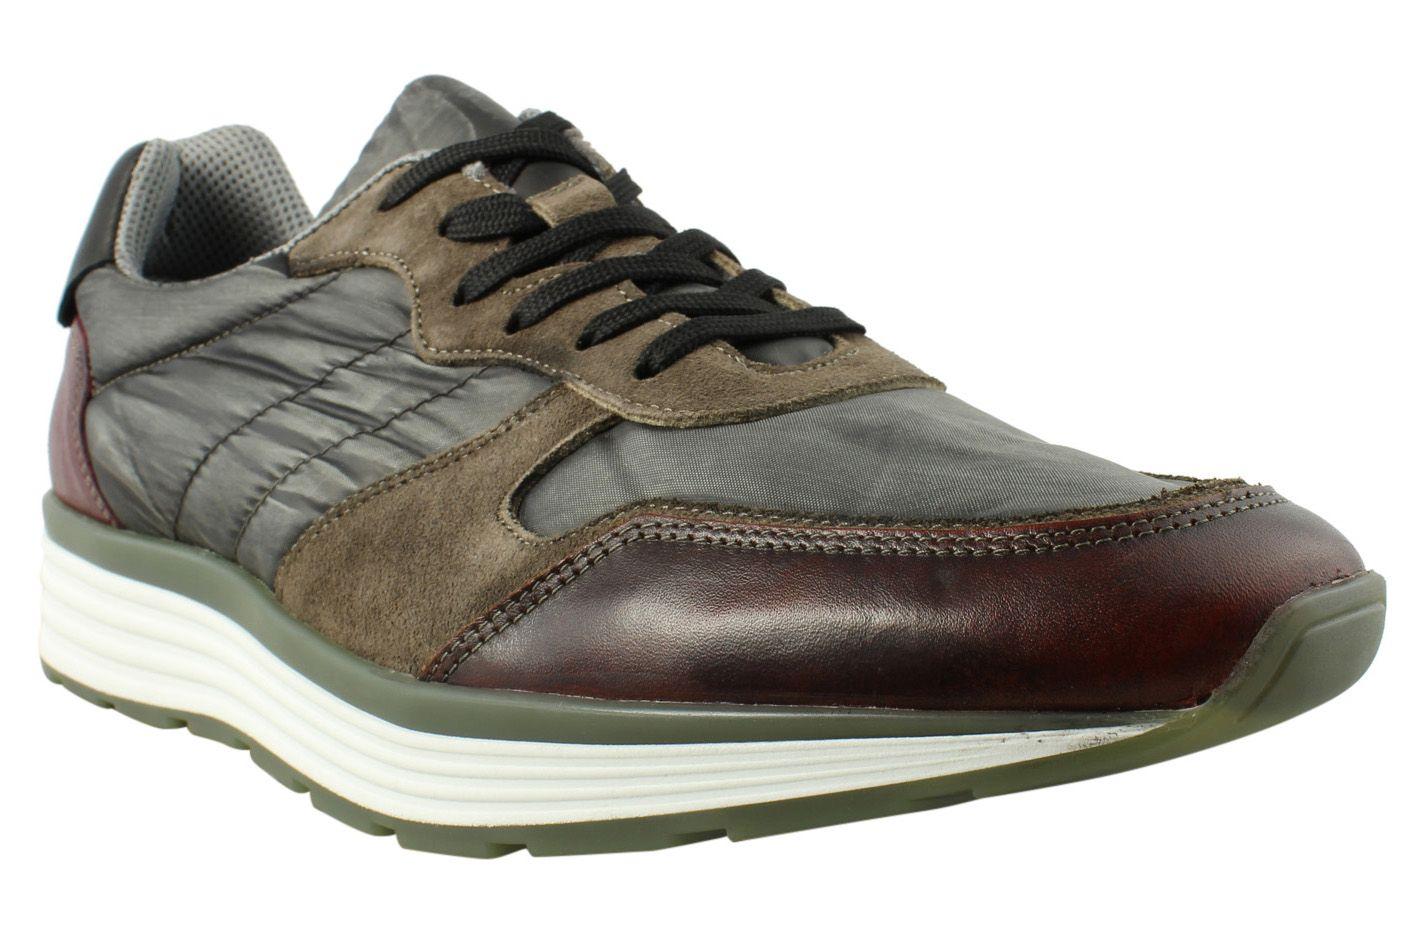 f615953fd8f STEVE MADDEN STEVE MADDEN MENS HEROE MULTI-COLOR FASHION SHOES.  stevemadden   shoes